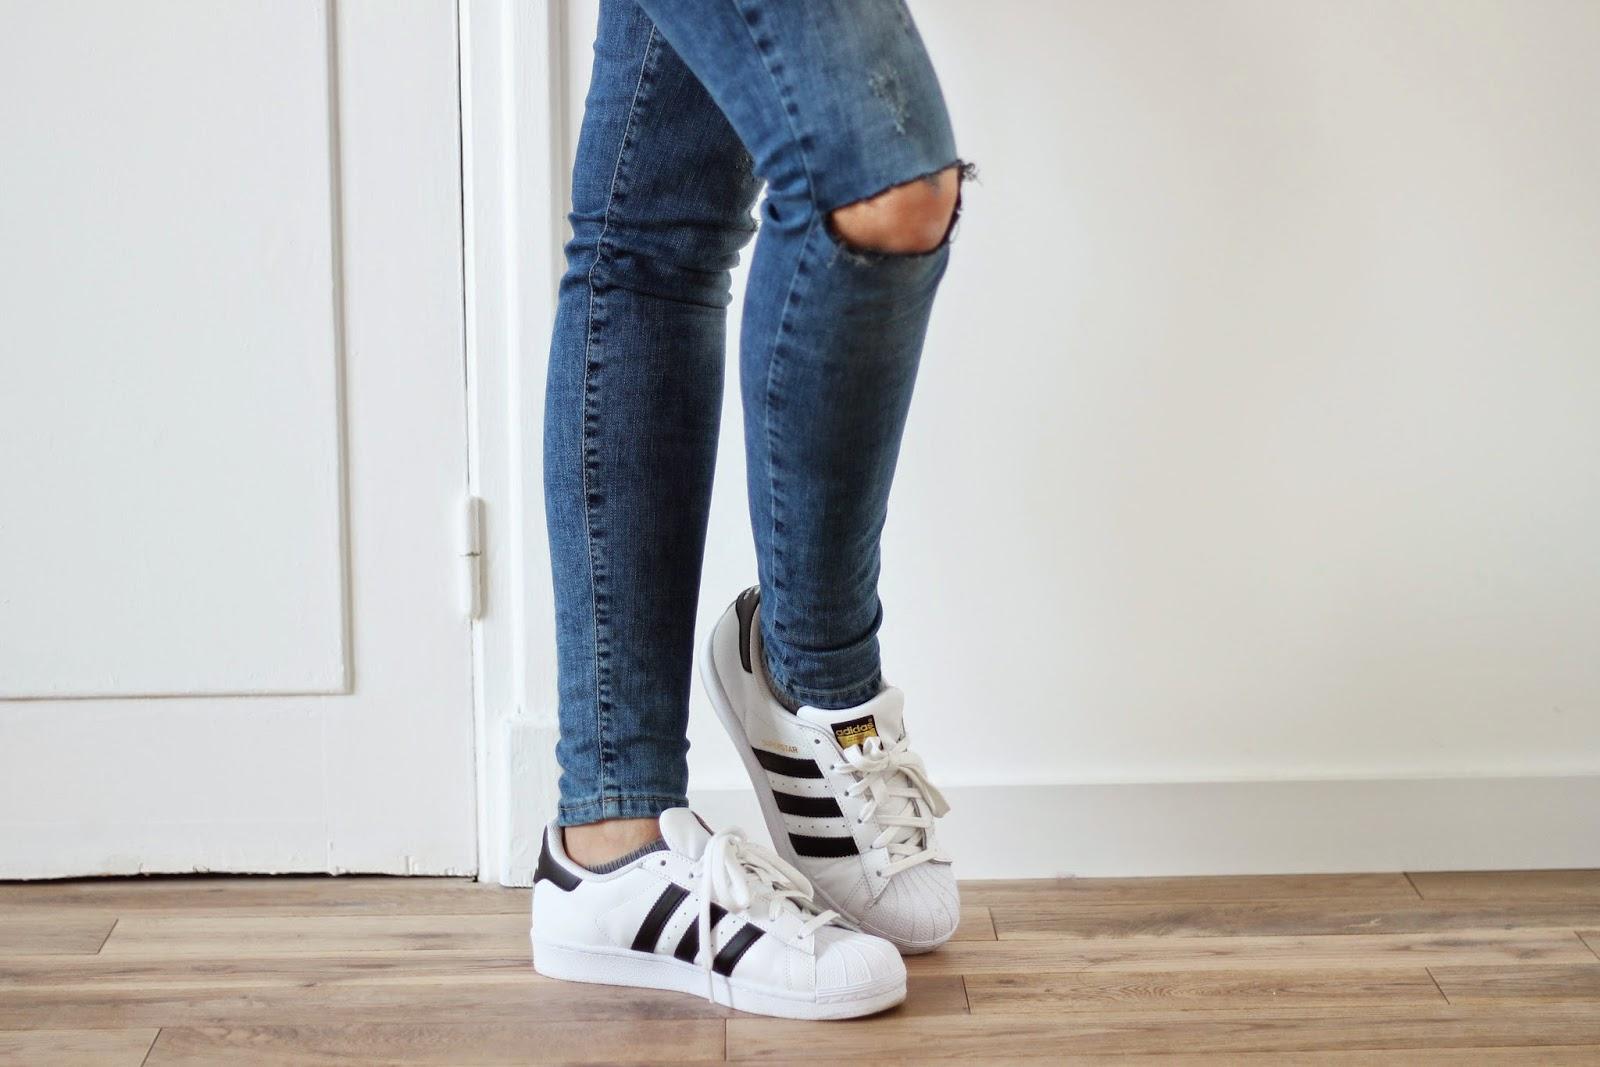 Portee Chaussures Adidas Femme Ju201 Superstar pYq4xzY